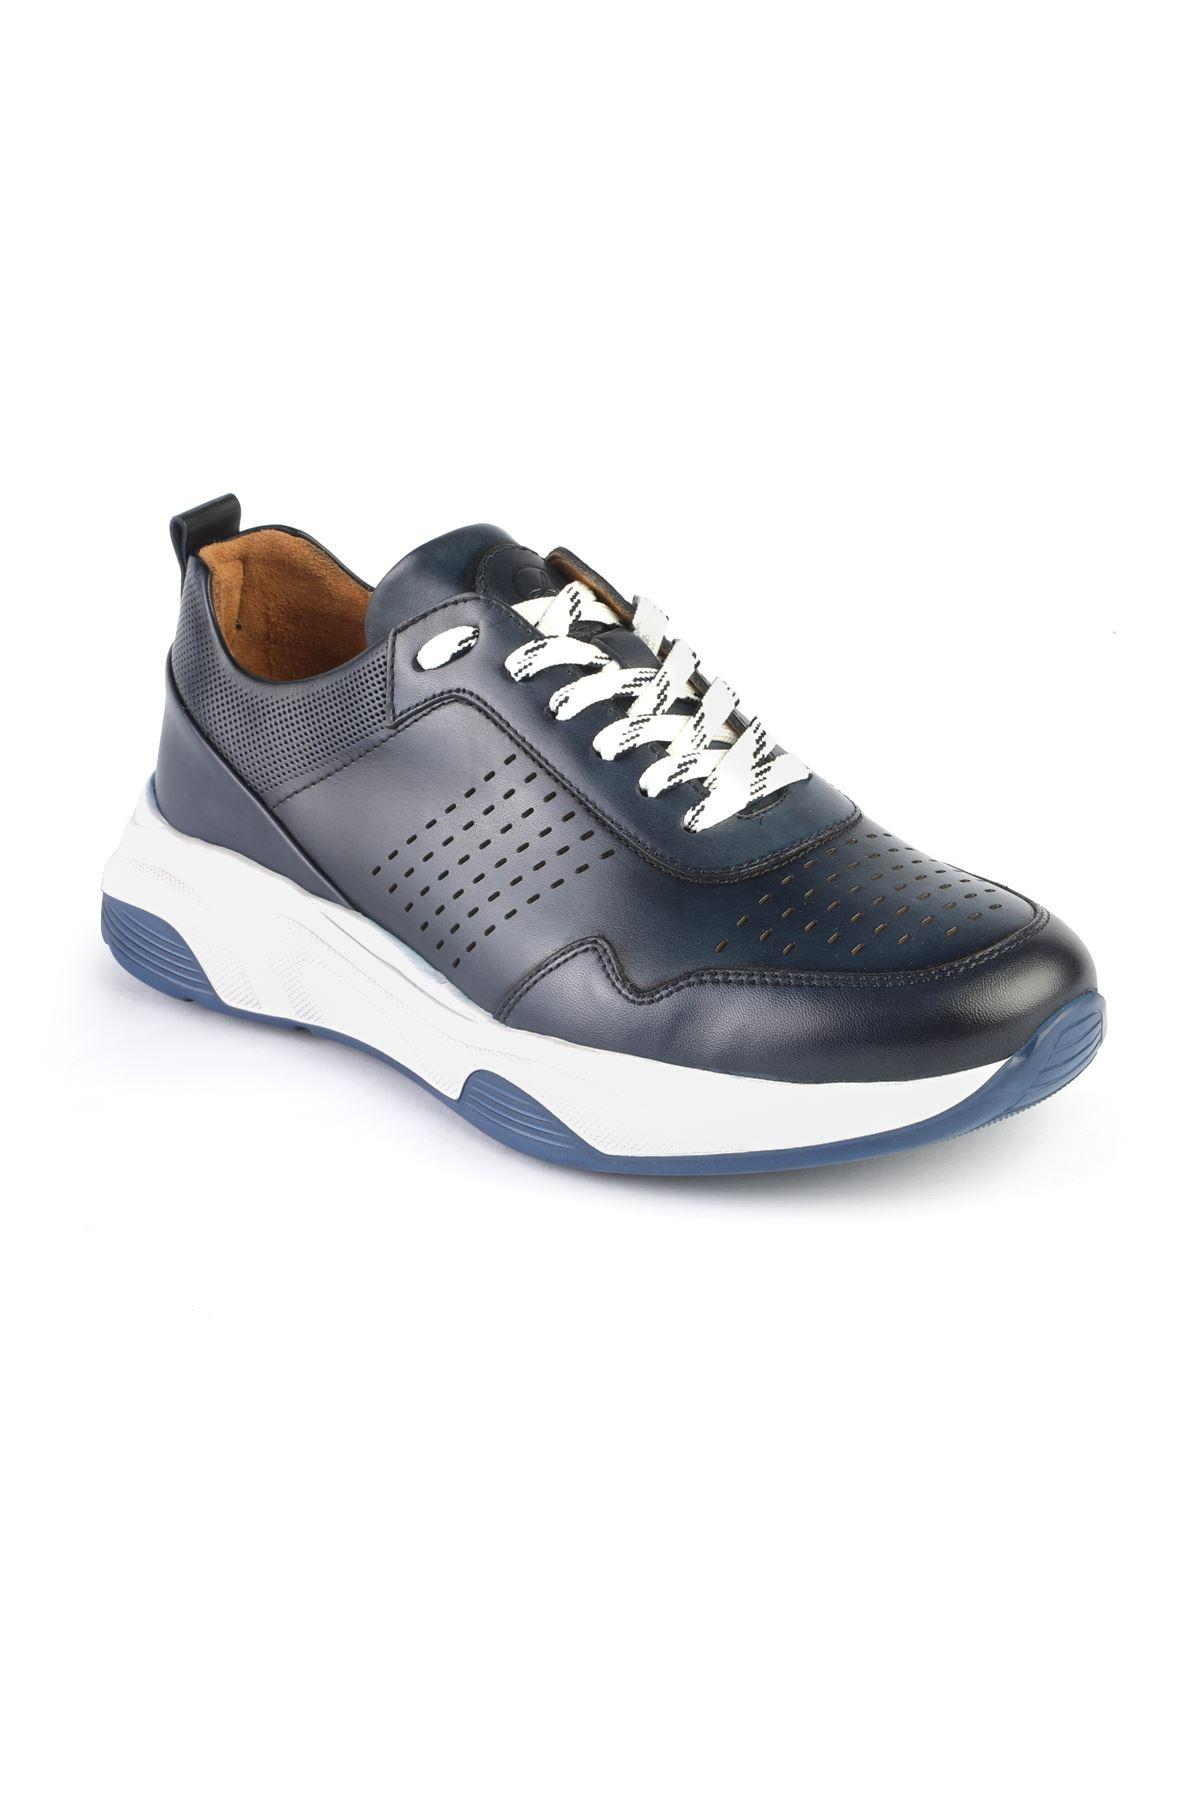 Libero 3313 Navy Blue Sport Shoes